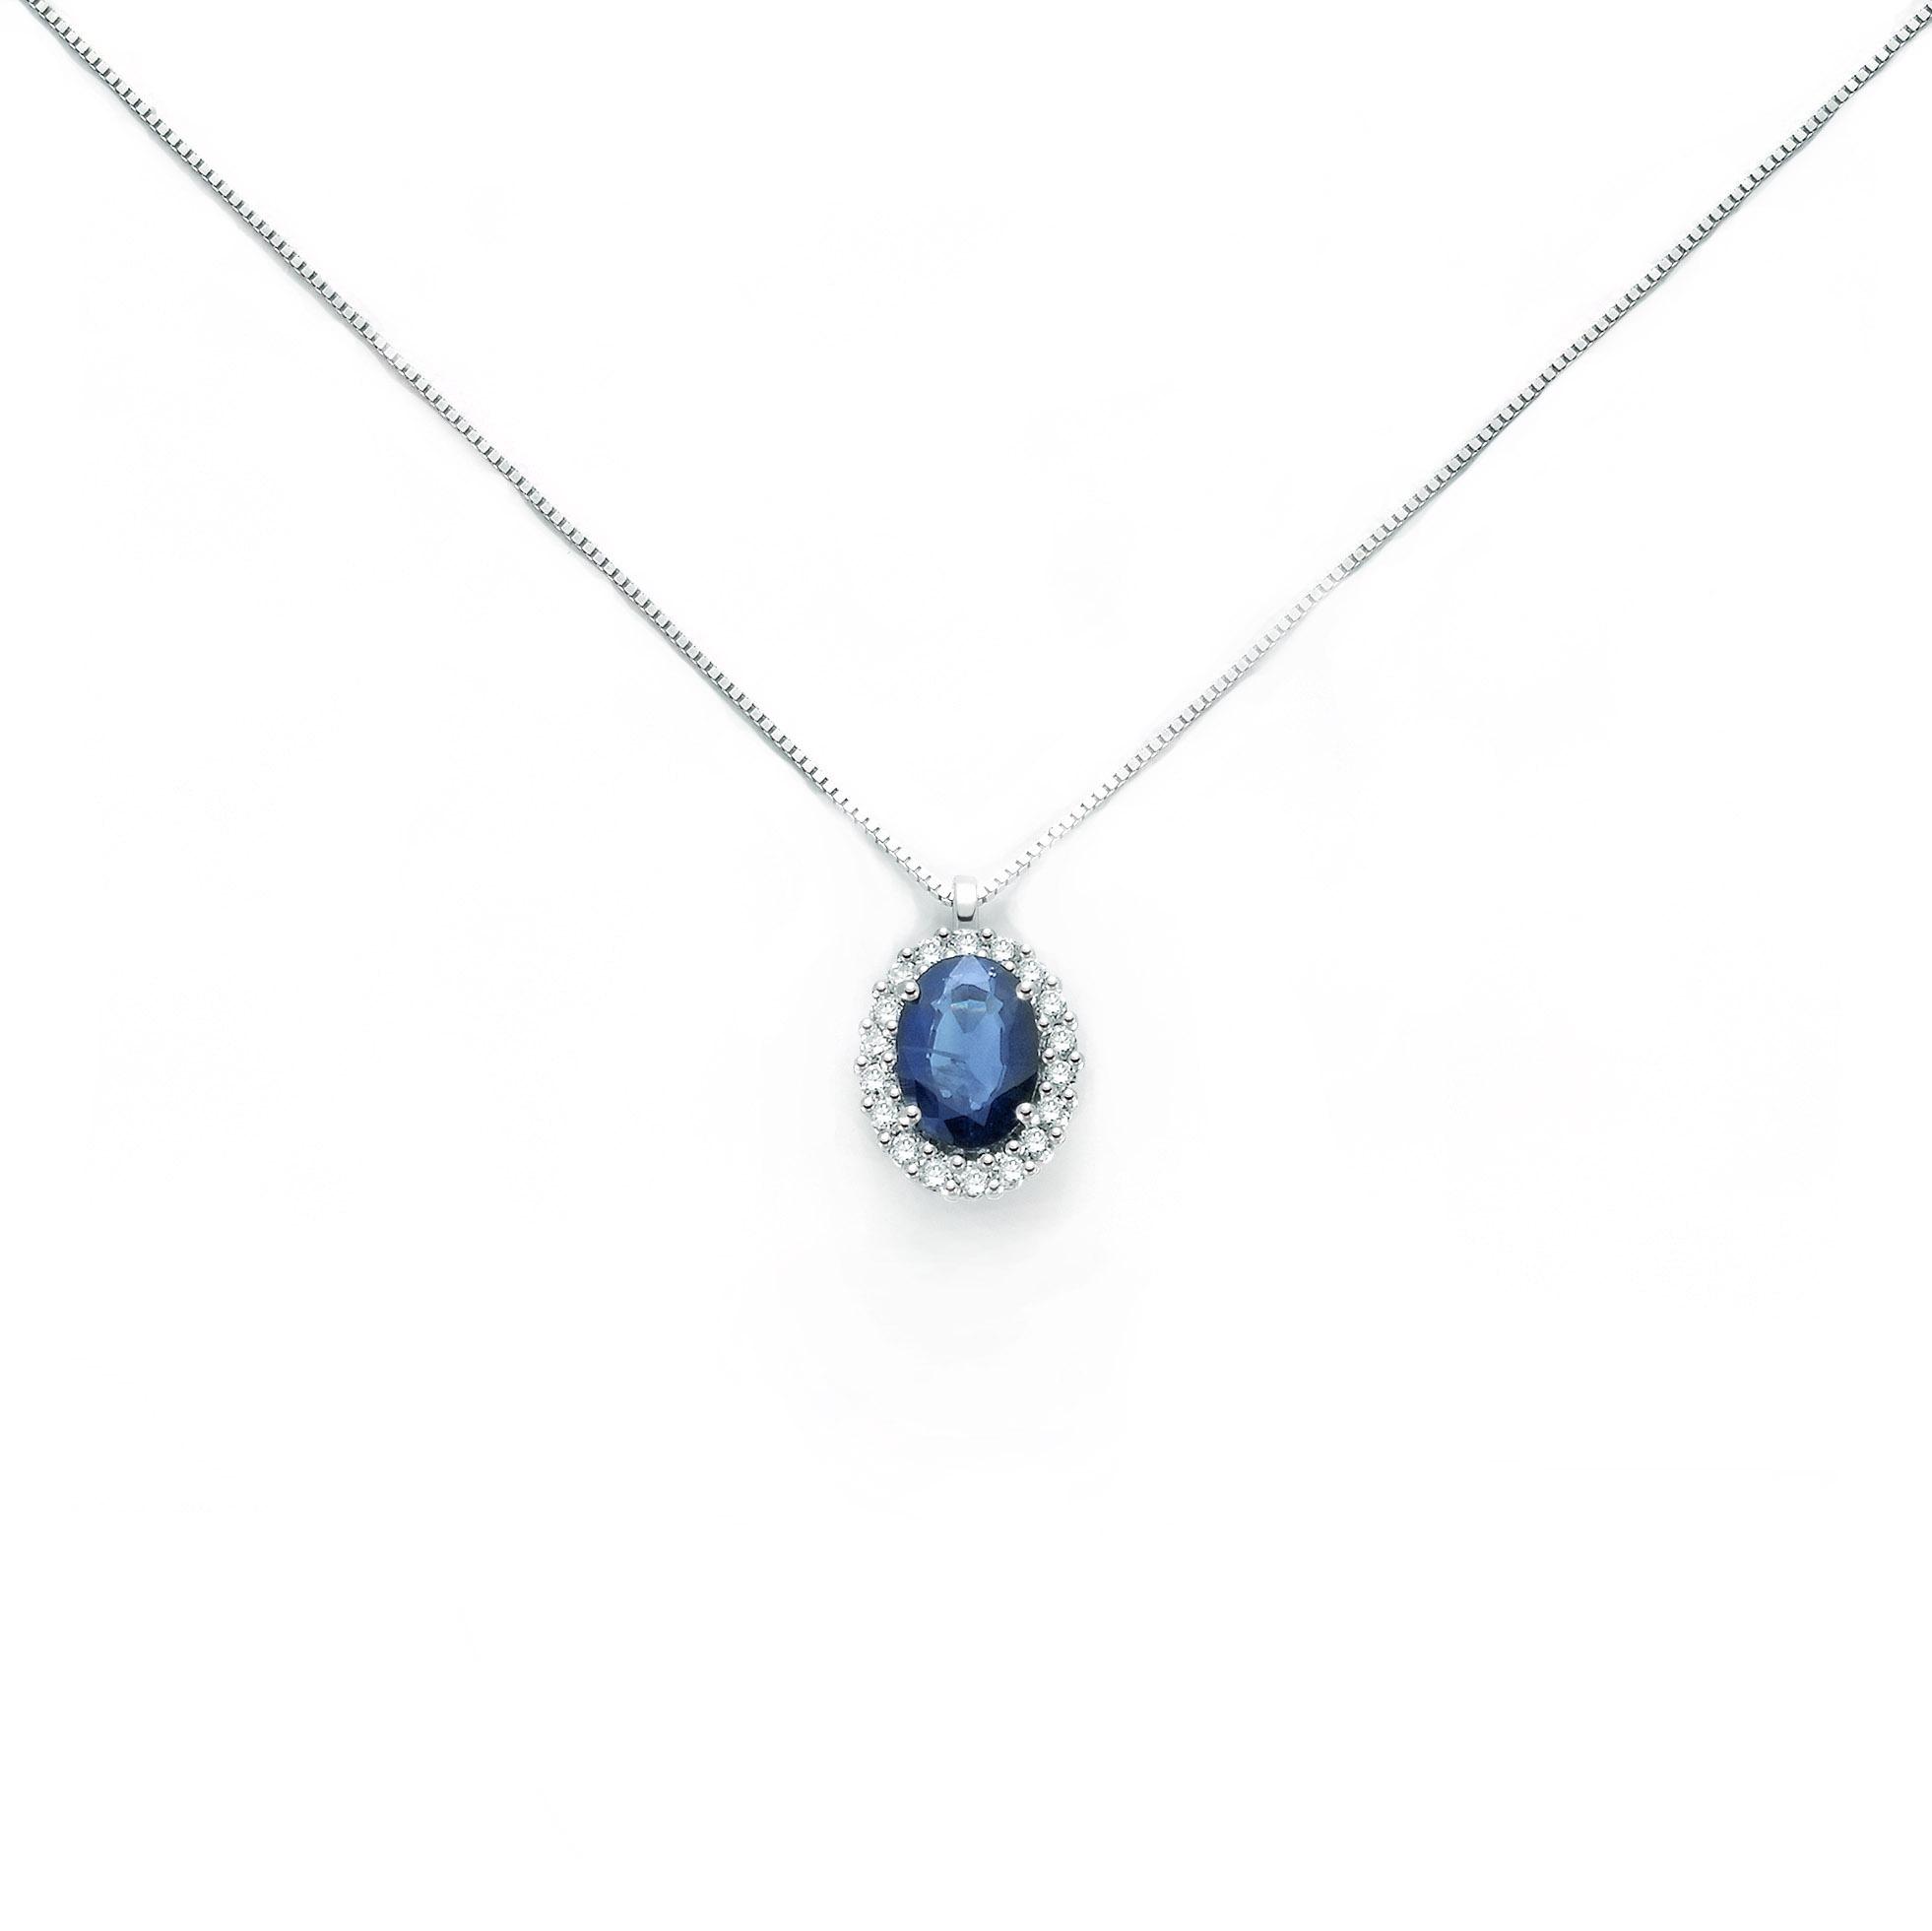 collana miluna collier zaffiro blu diamanti